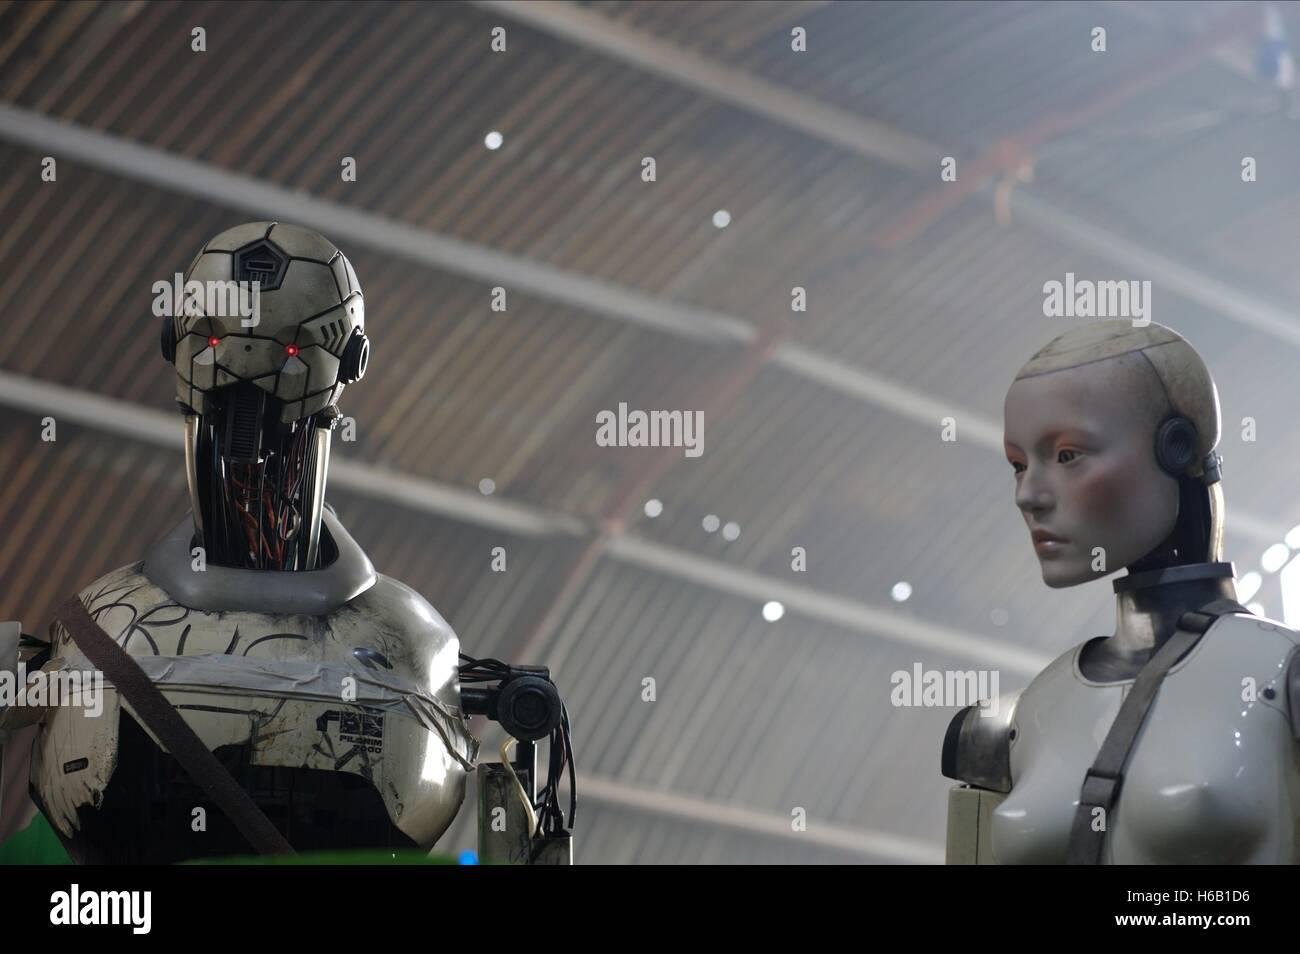 HUMANOID PILGRIM ROBOTS AUTOMATA (2014) - Stock Image